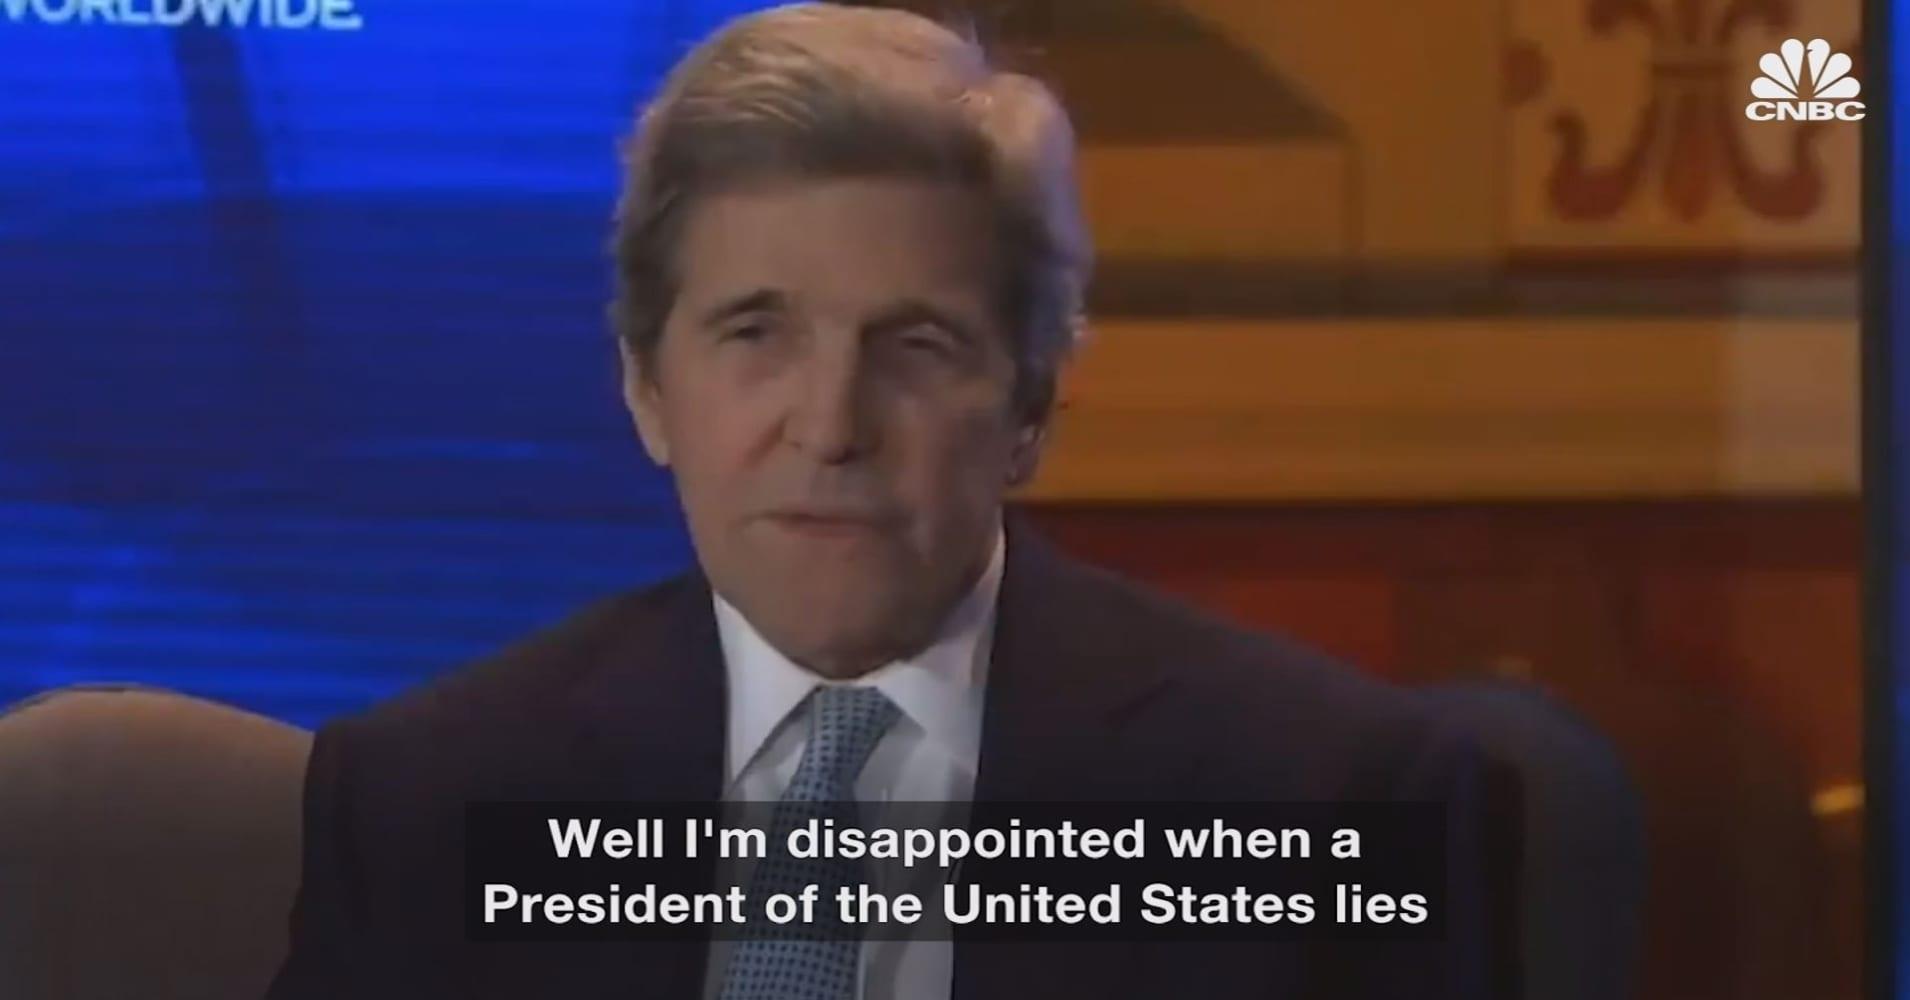 Former Secretary of State John Kerry just said President Trump should resign